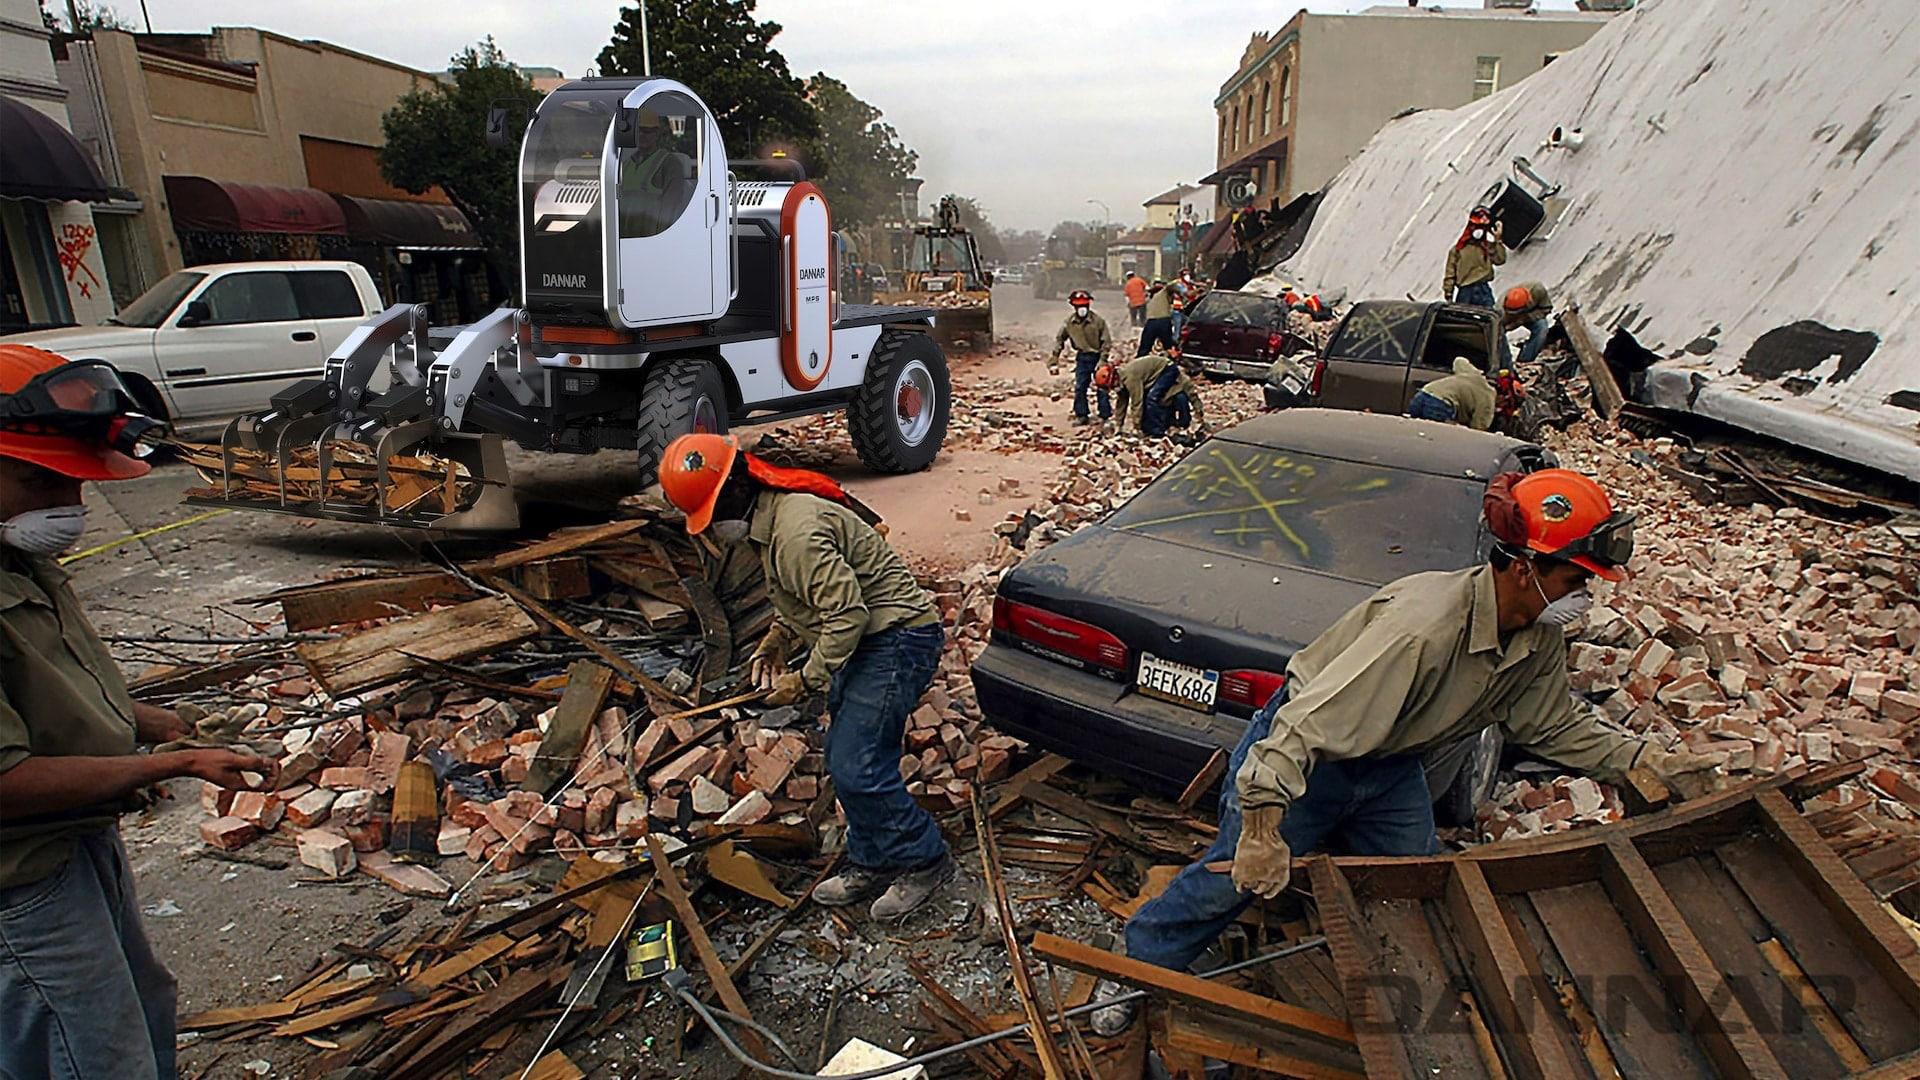 DANNAR MPS 400 Revolutionary Work Vehicle Crisis Response